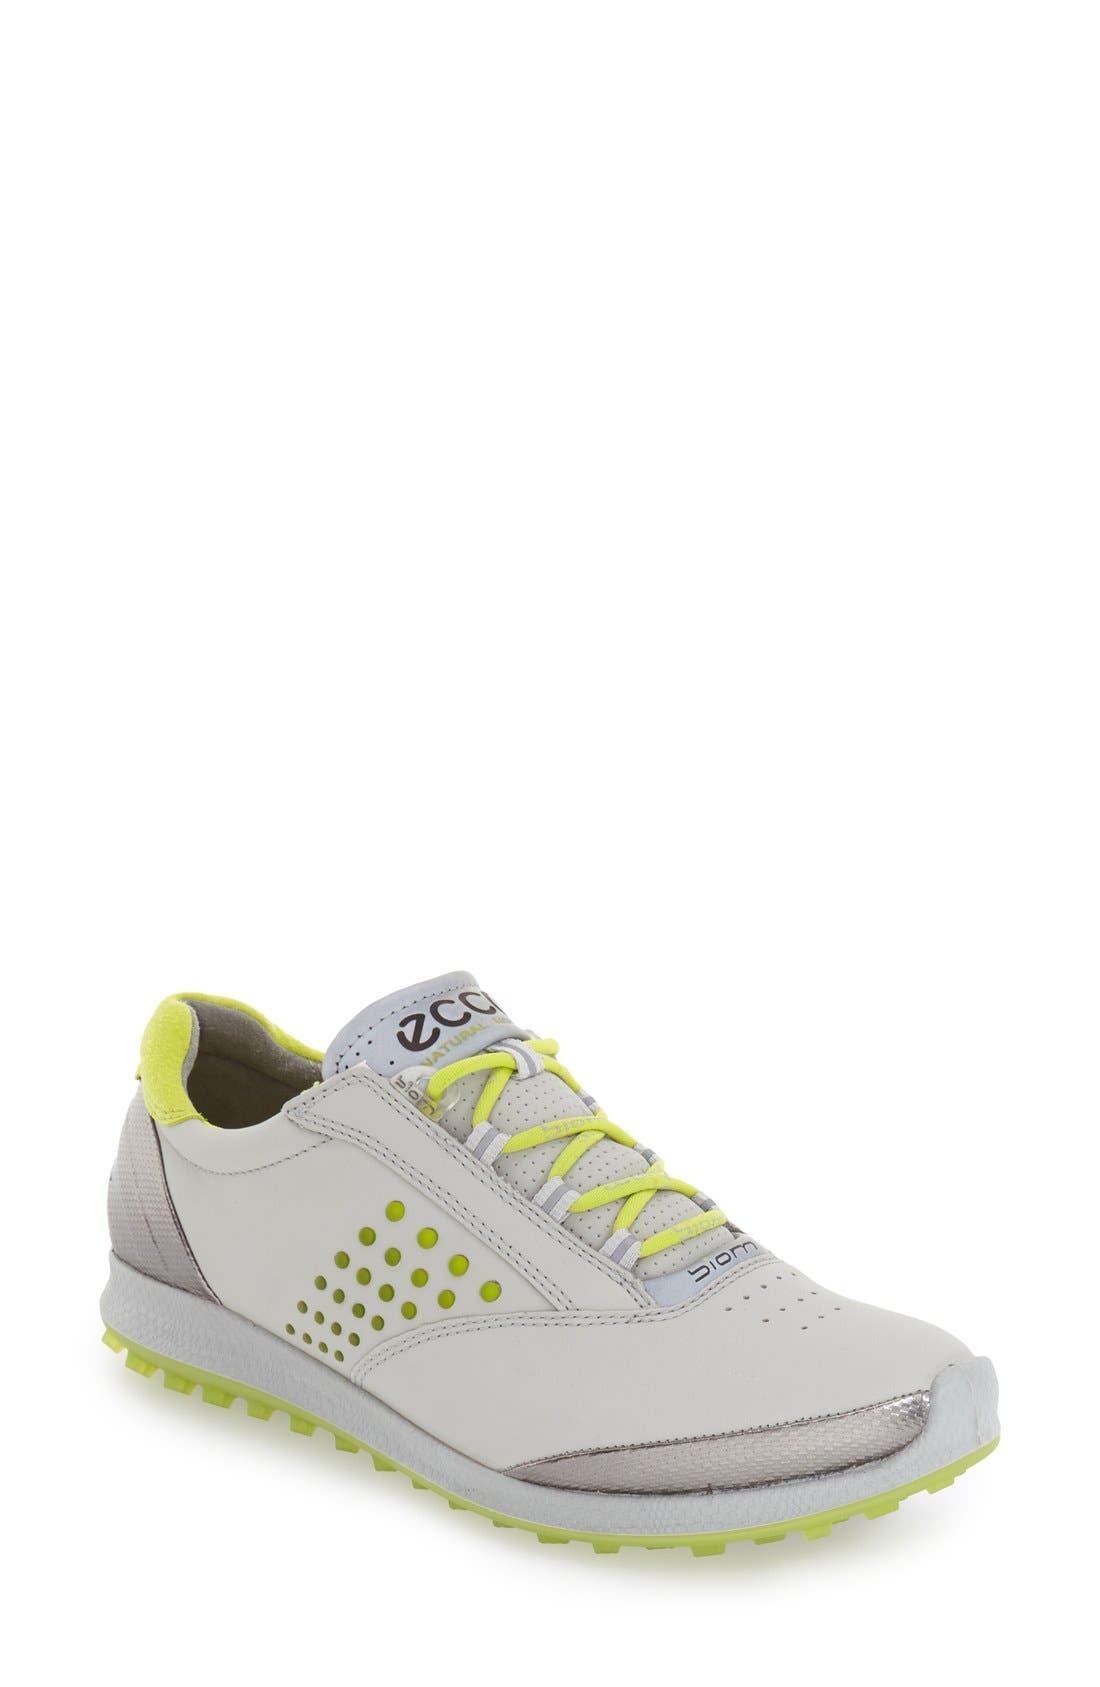 'BIOM' Hydromax<sup>®</sup> Waterproof Golf Shoe,                             Main thumbnail 1, color,                             Concrete Leather